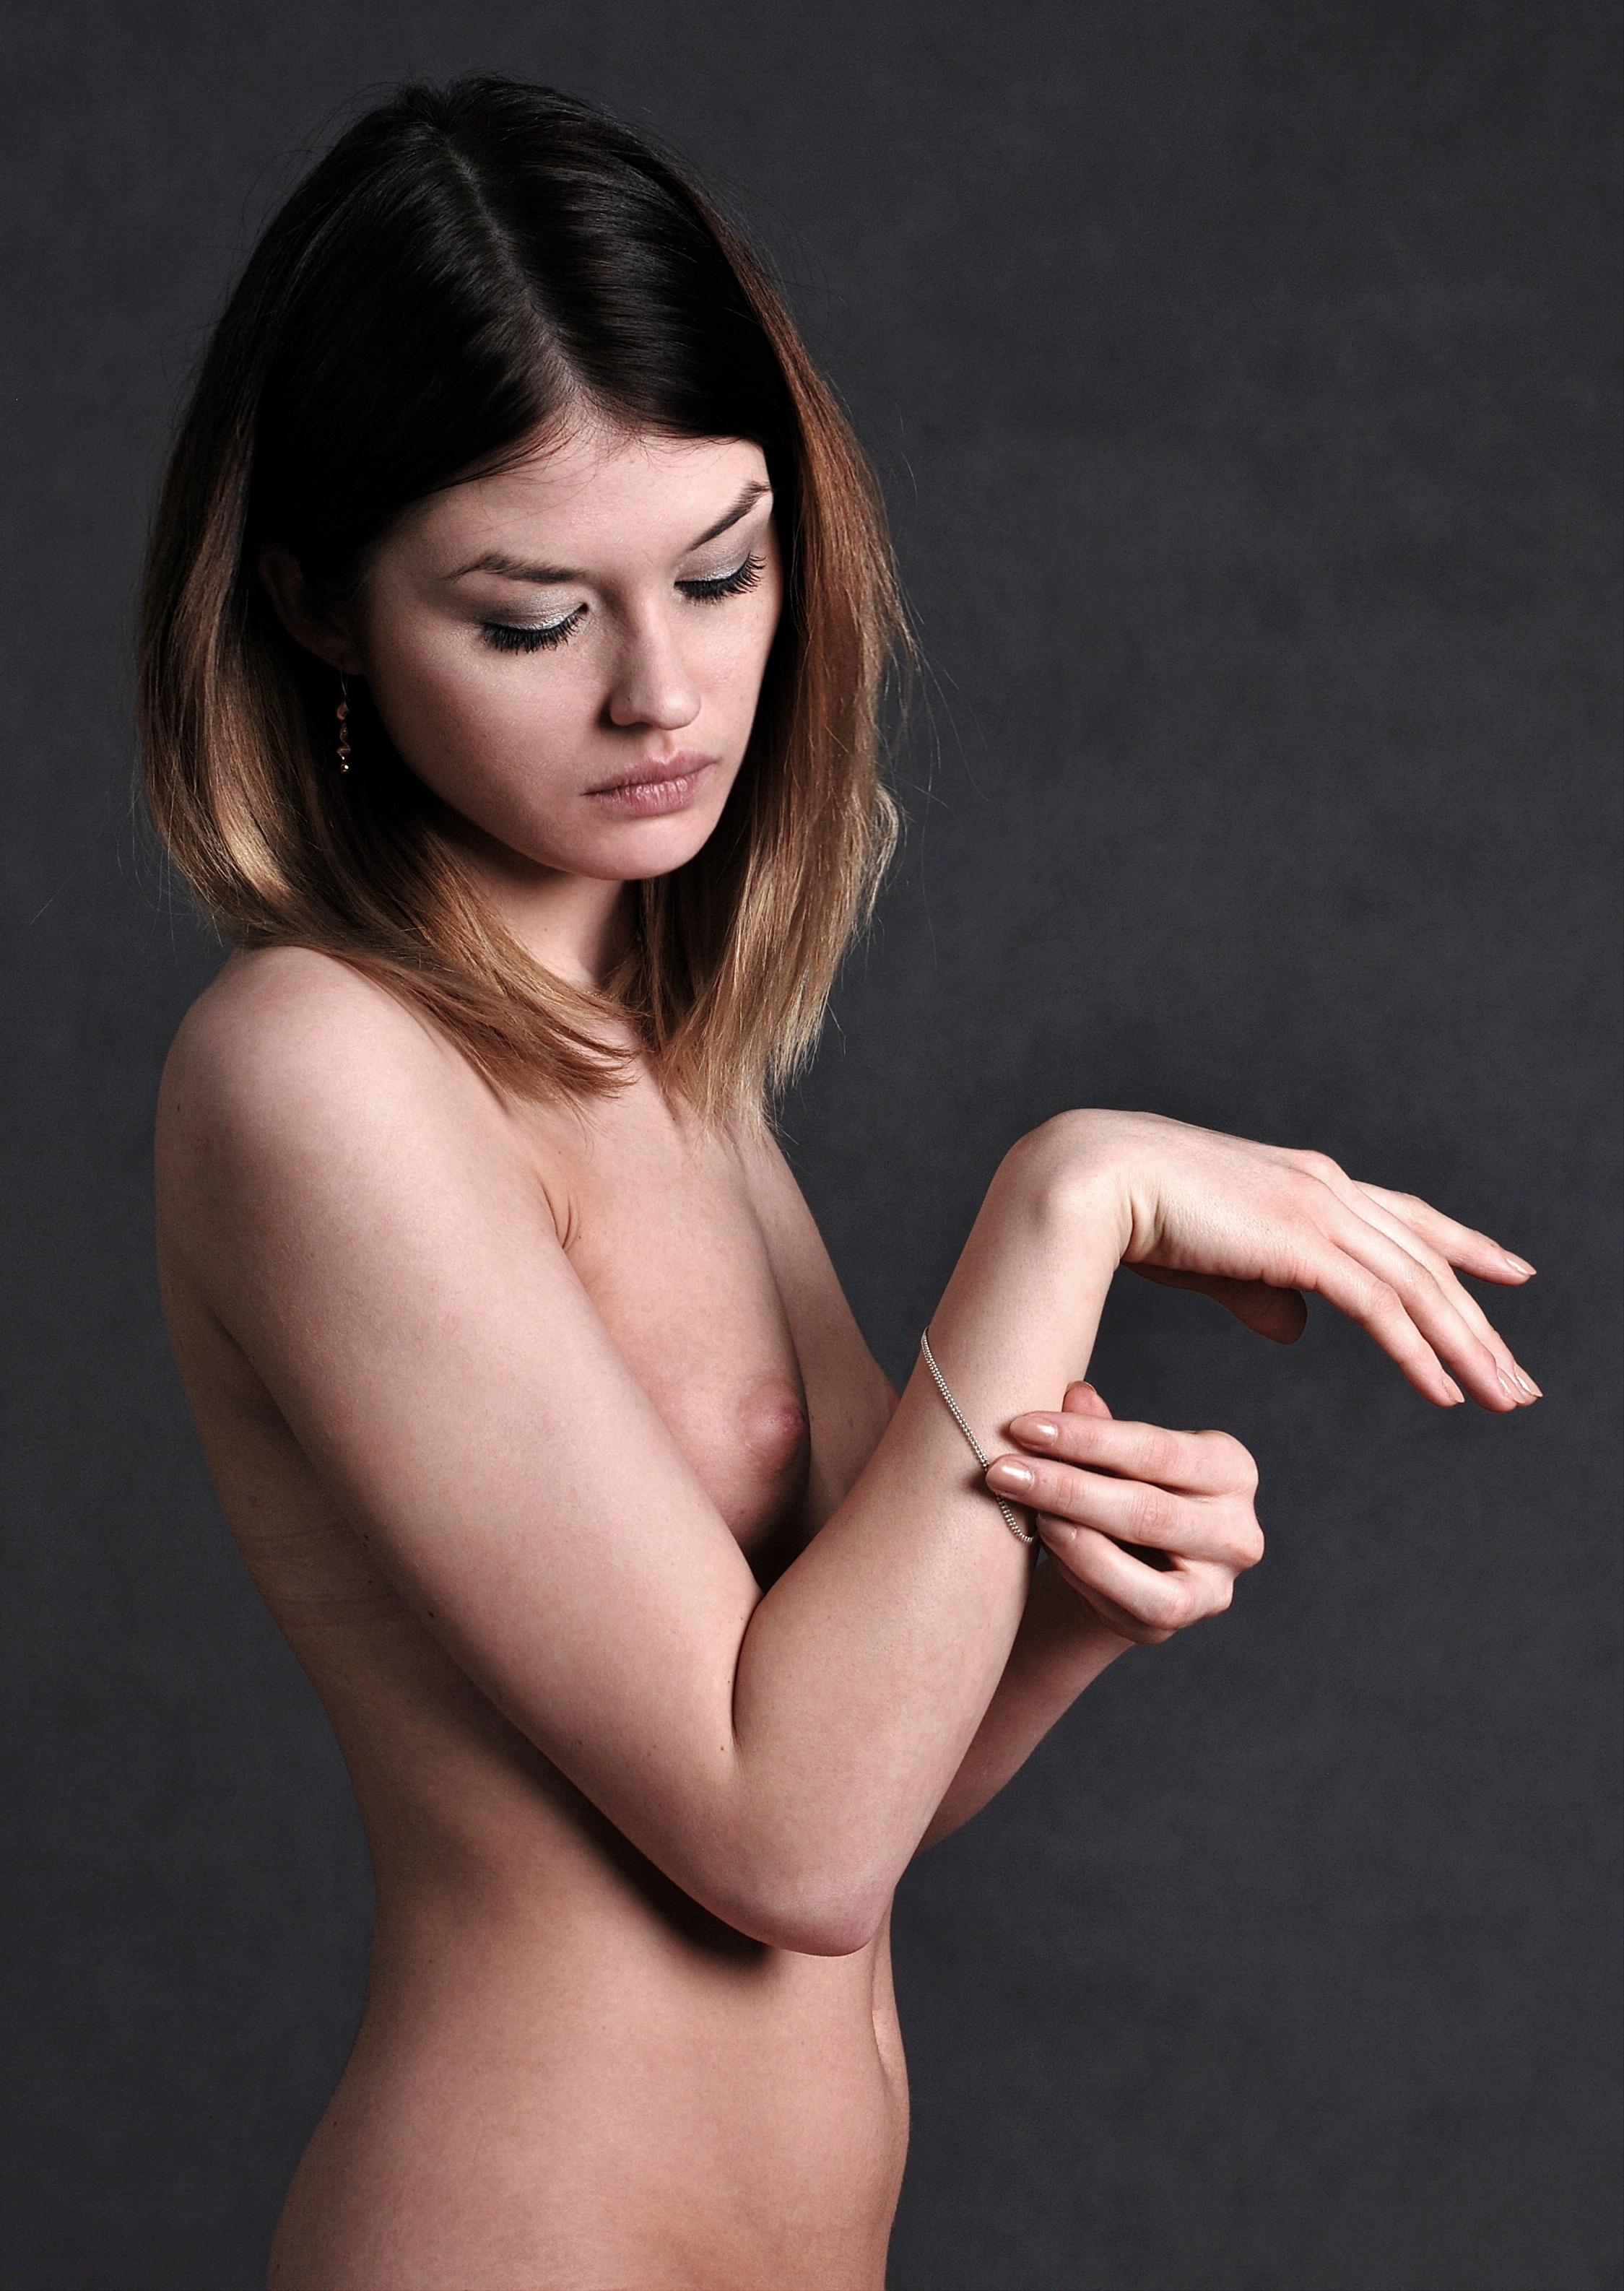 Free Images  Hand, Girl, Woman, Brunette, Finger, Arm -8475